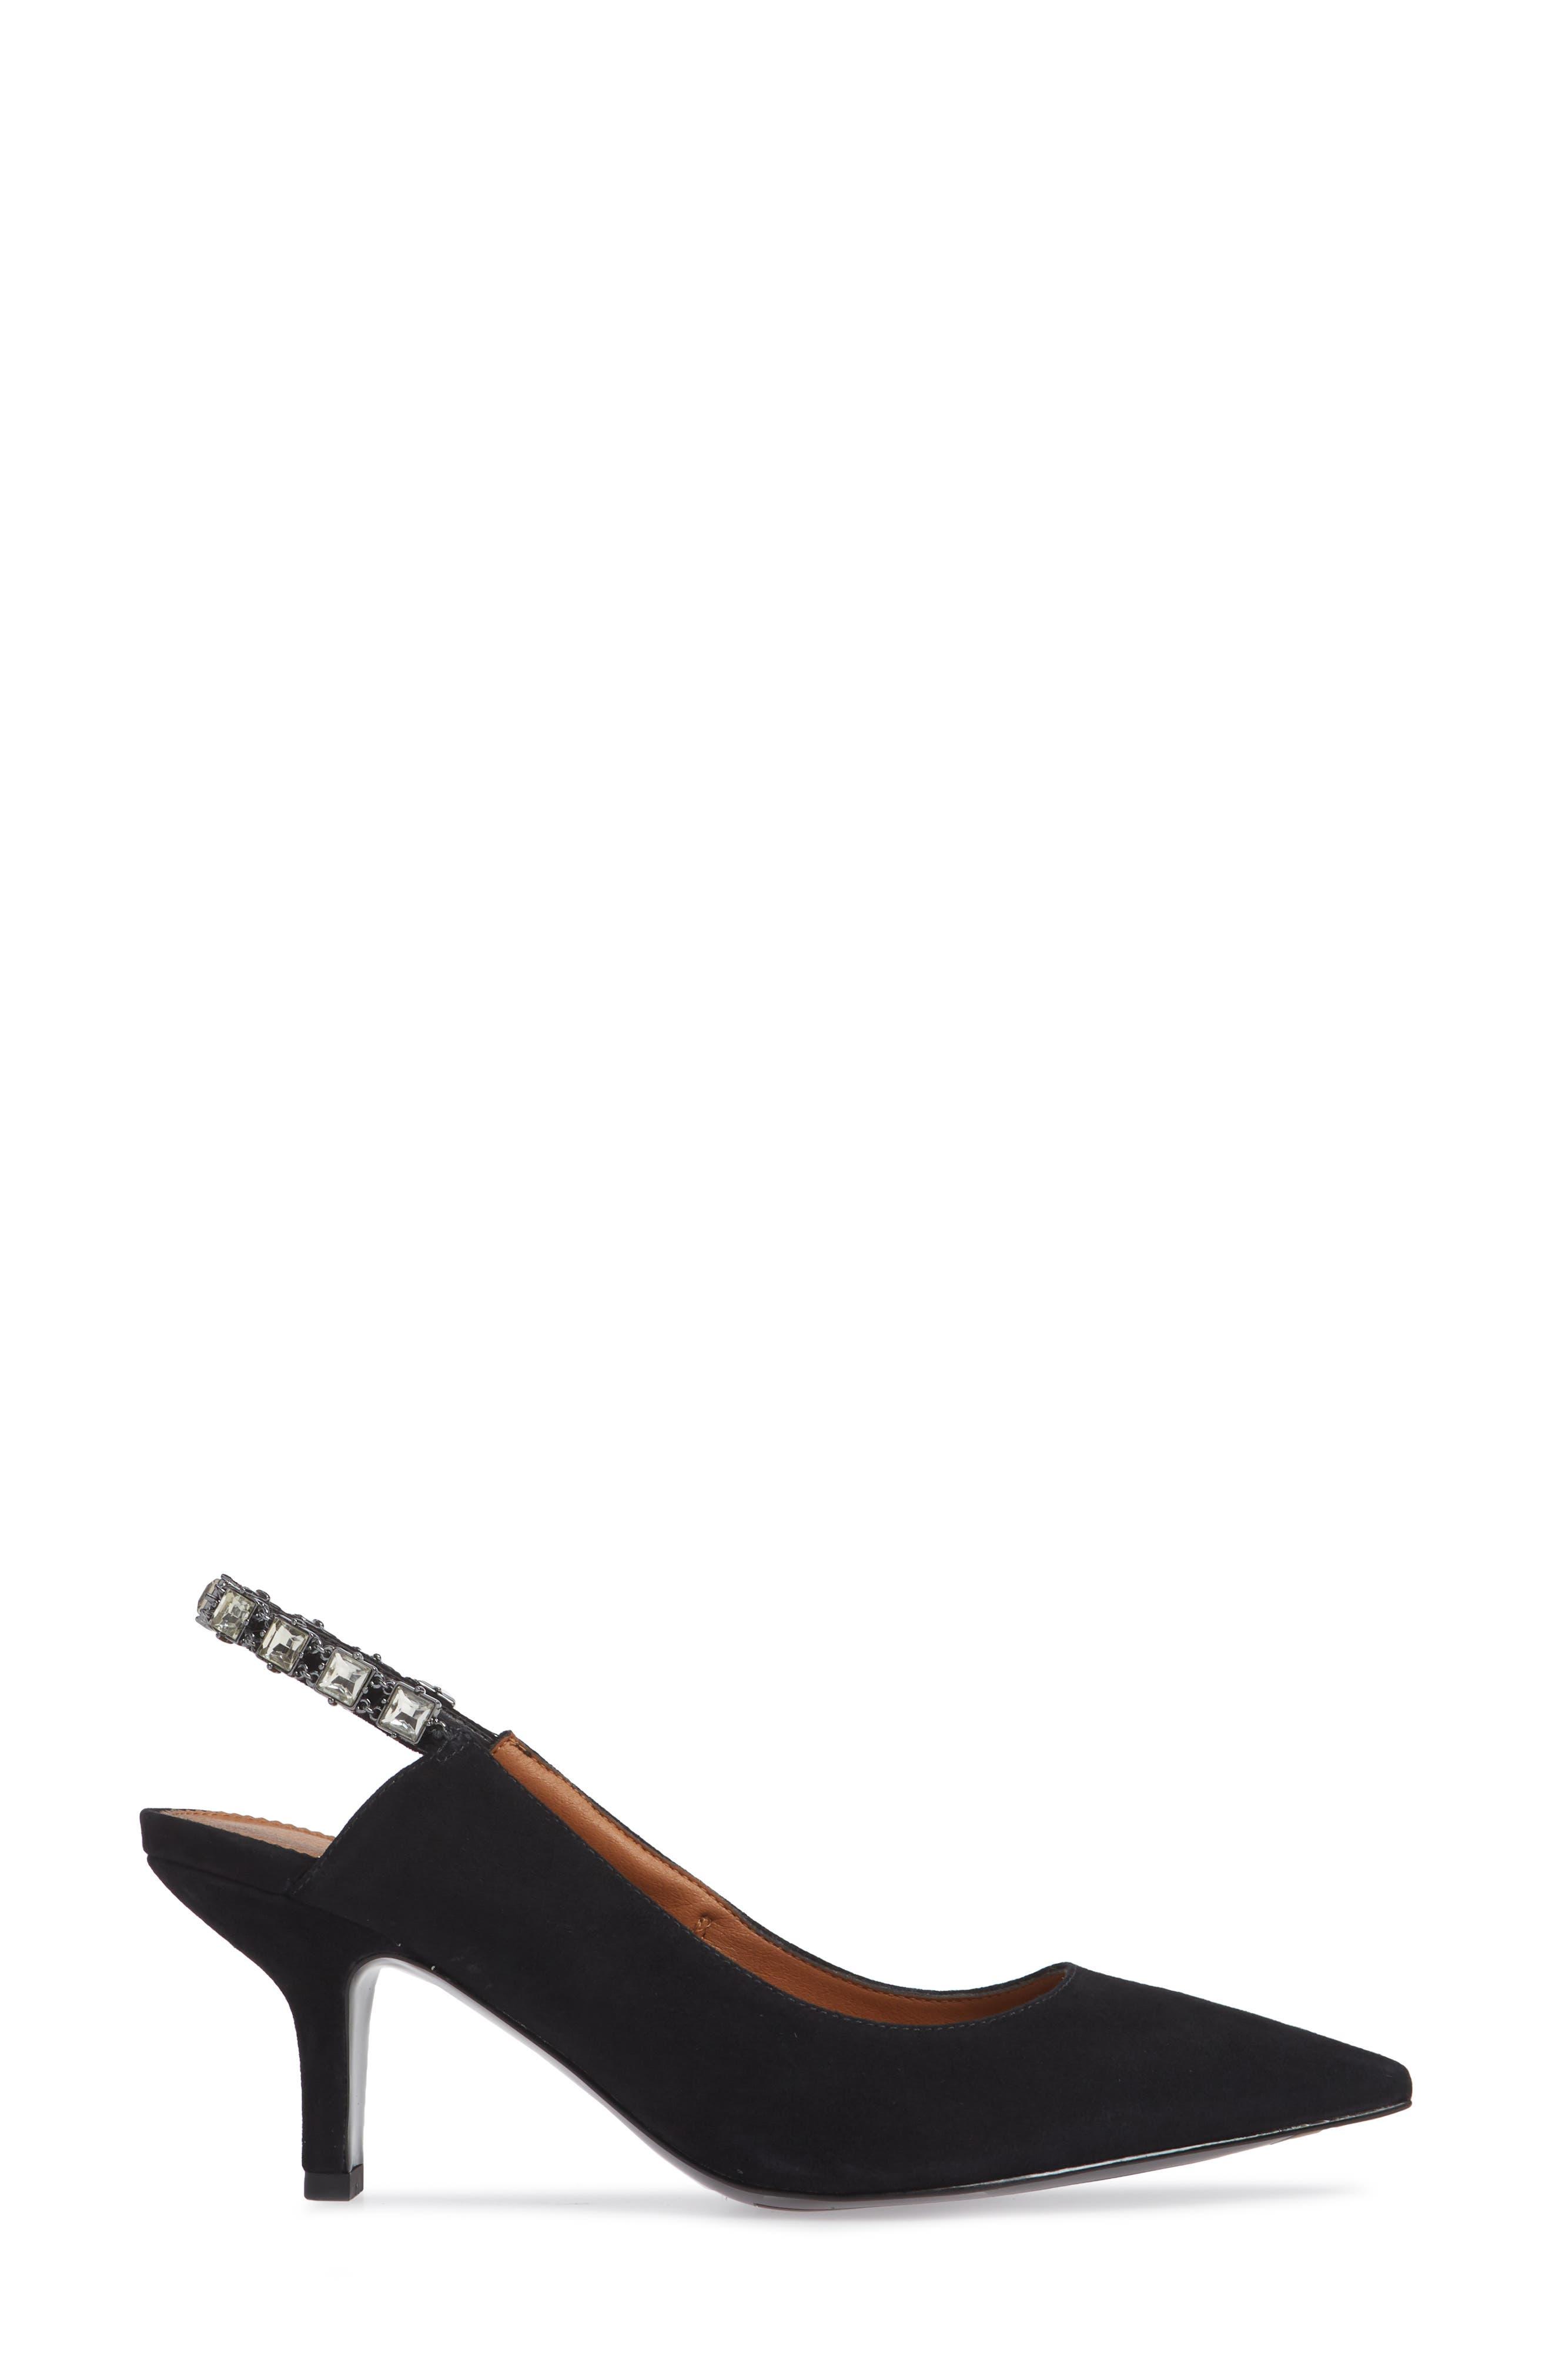 Dynasty II Slingback Pump,                             Alternate thumbnail 3, color,                             BLACK SUEDE